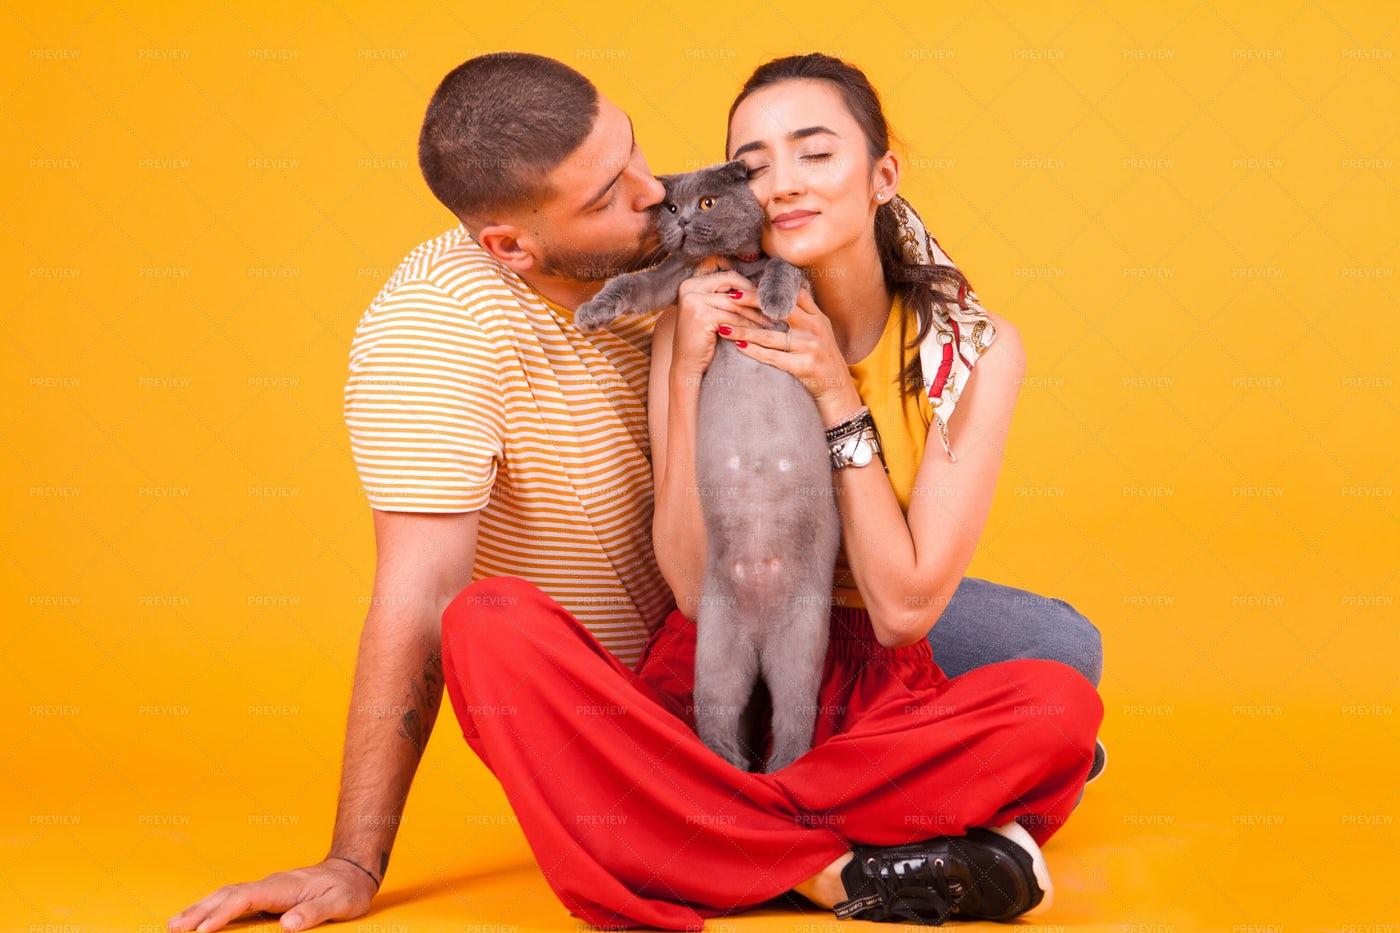 Couple Kissing Their Pet Cat: Stock Photos